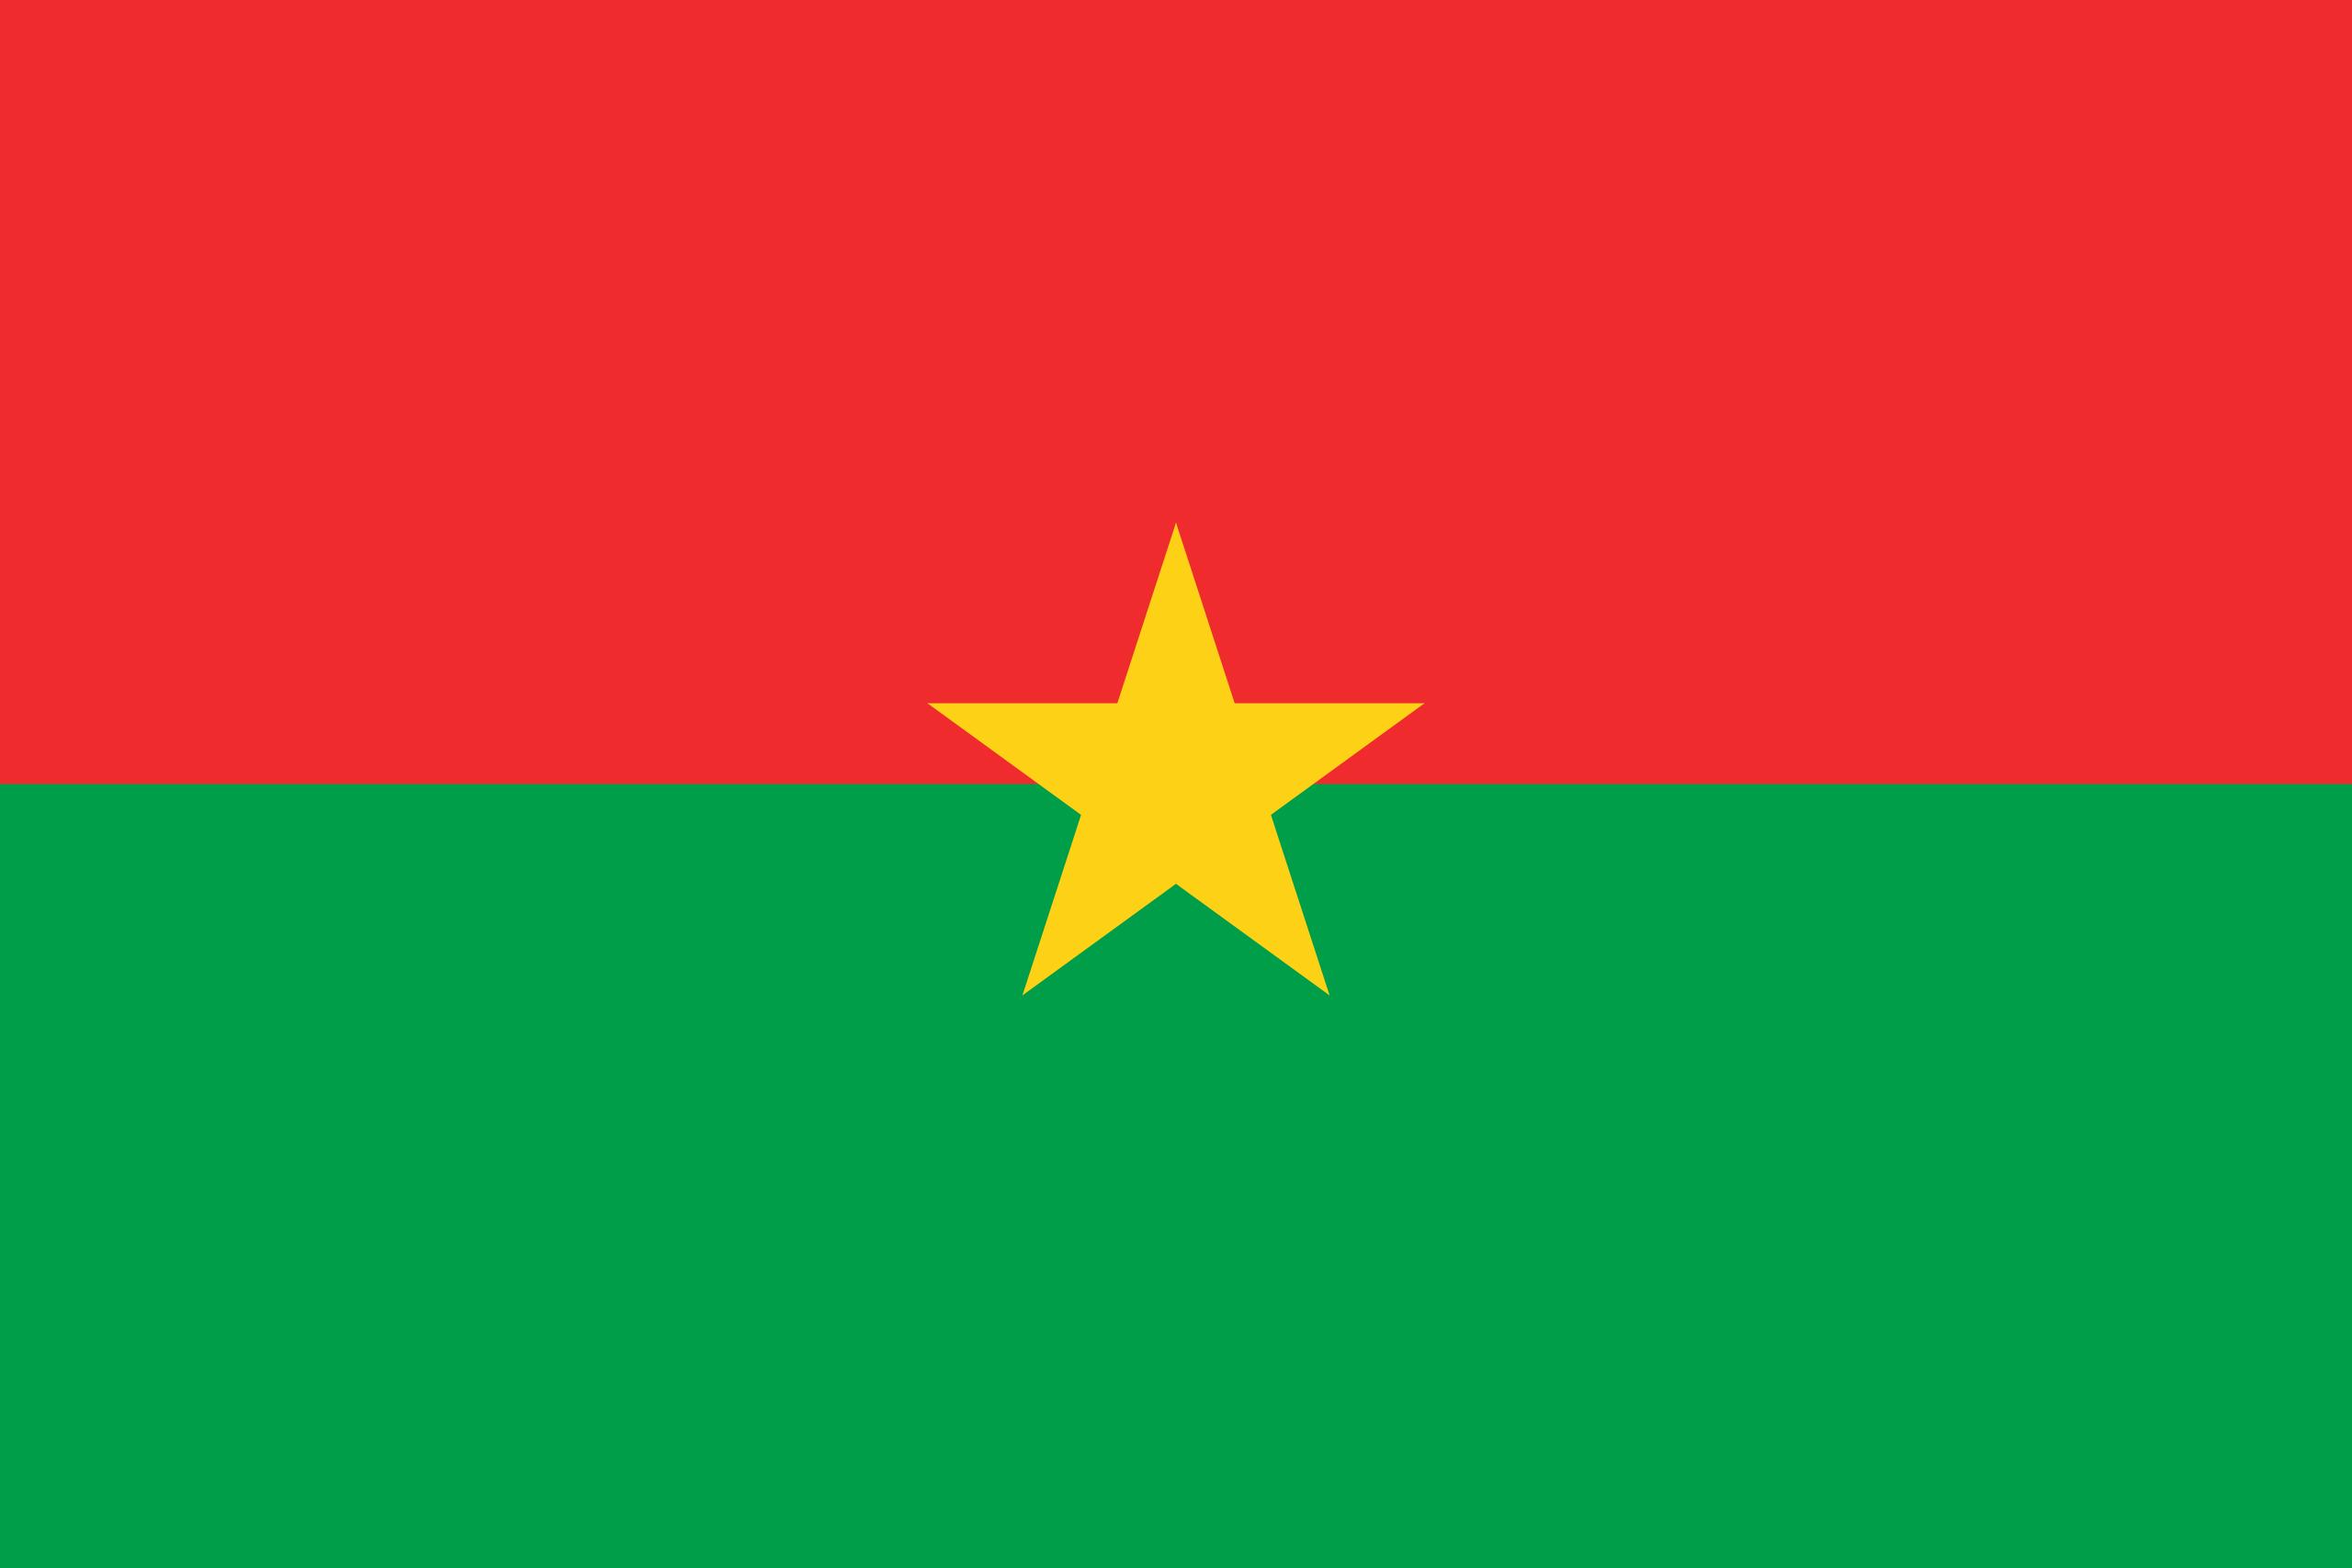 Flag of Burkina Faso